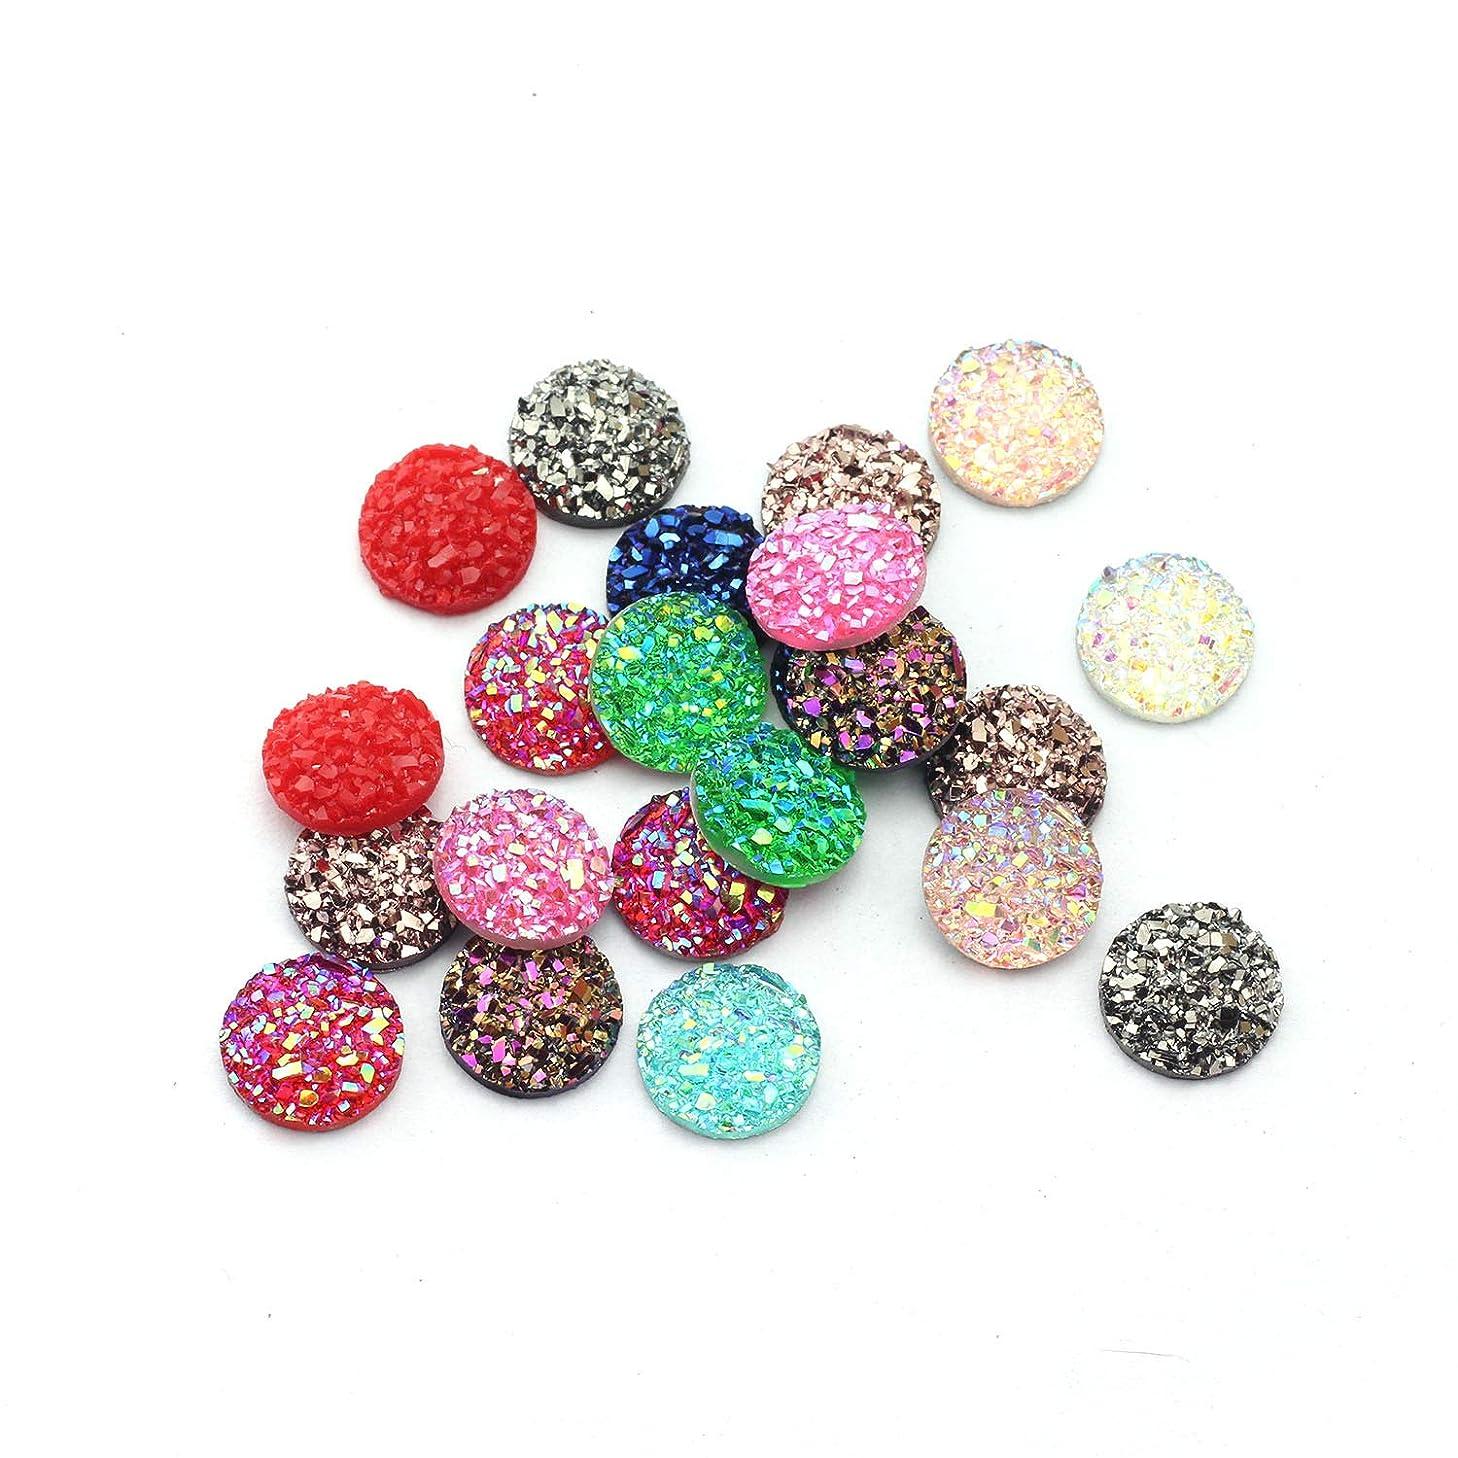 NX Garden 100PCS 10mm Colorfull Round Resin Rhinestone Diamante Flat Back Bubble Stick on Sparkle Gems Bling for DIY